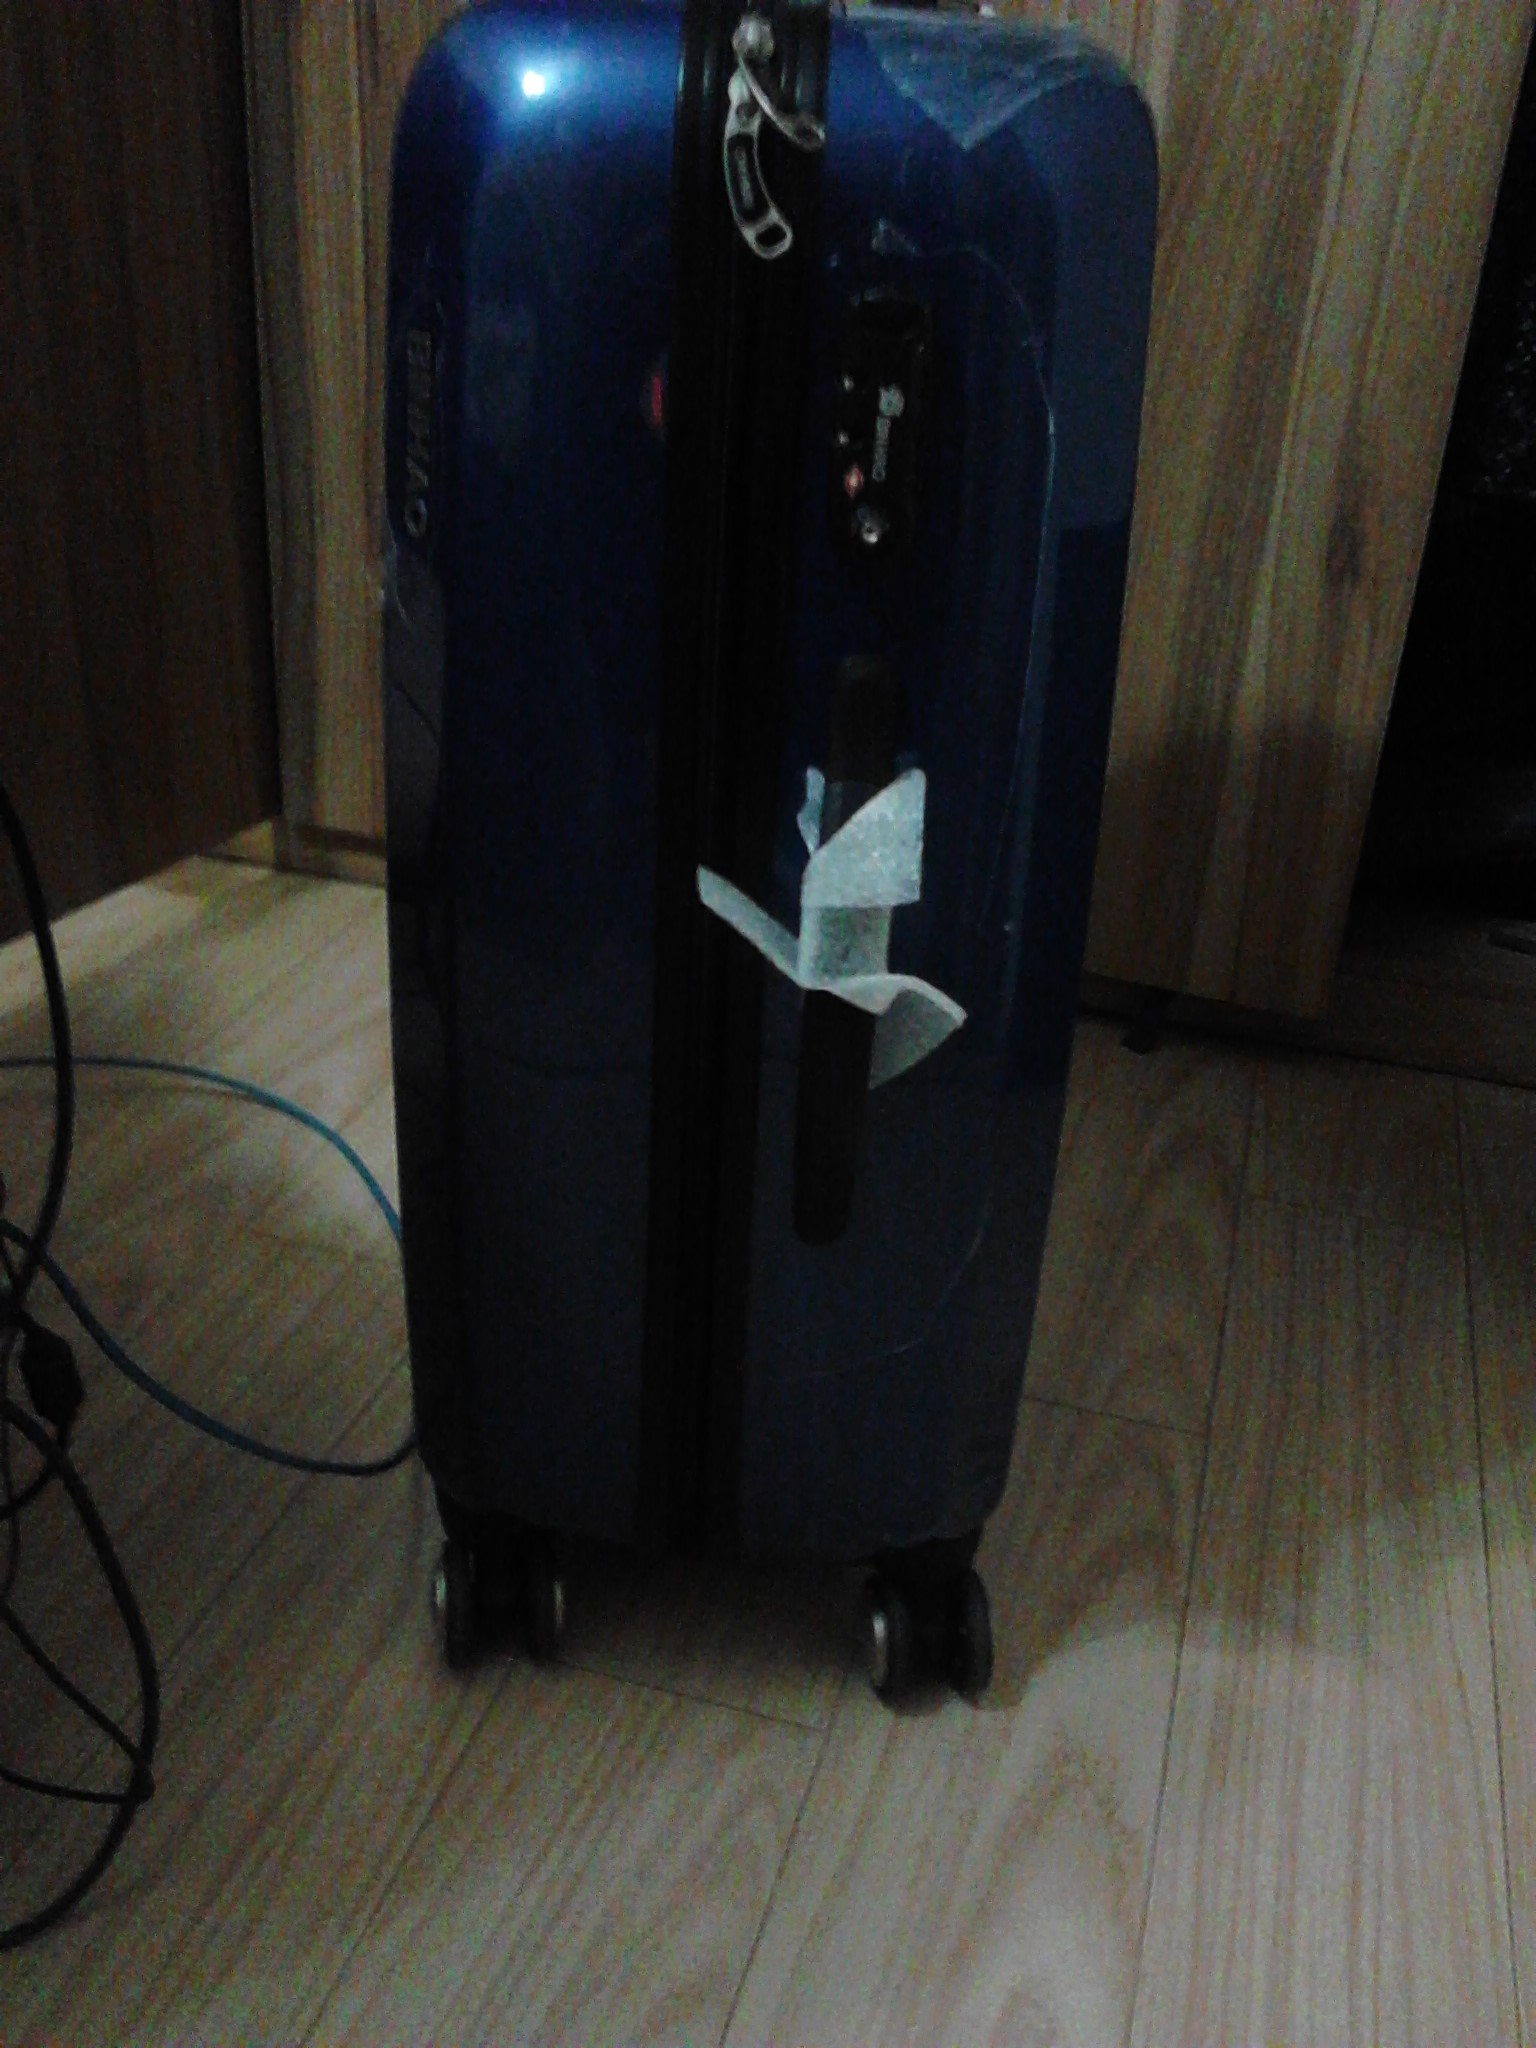 air jordan 3 sport blue on feet 00968251 outletonlineshop